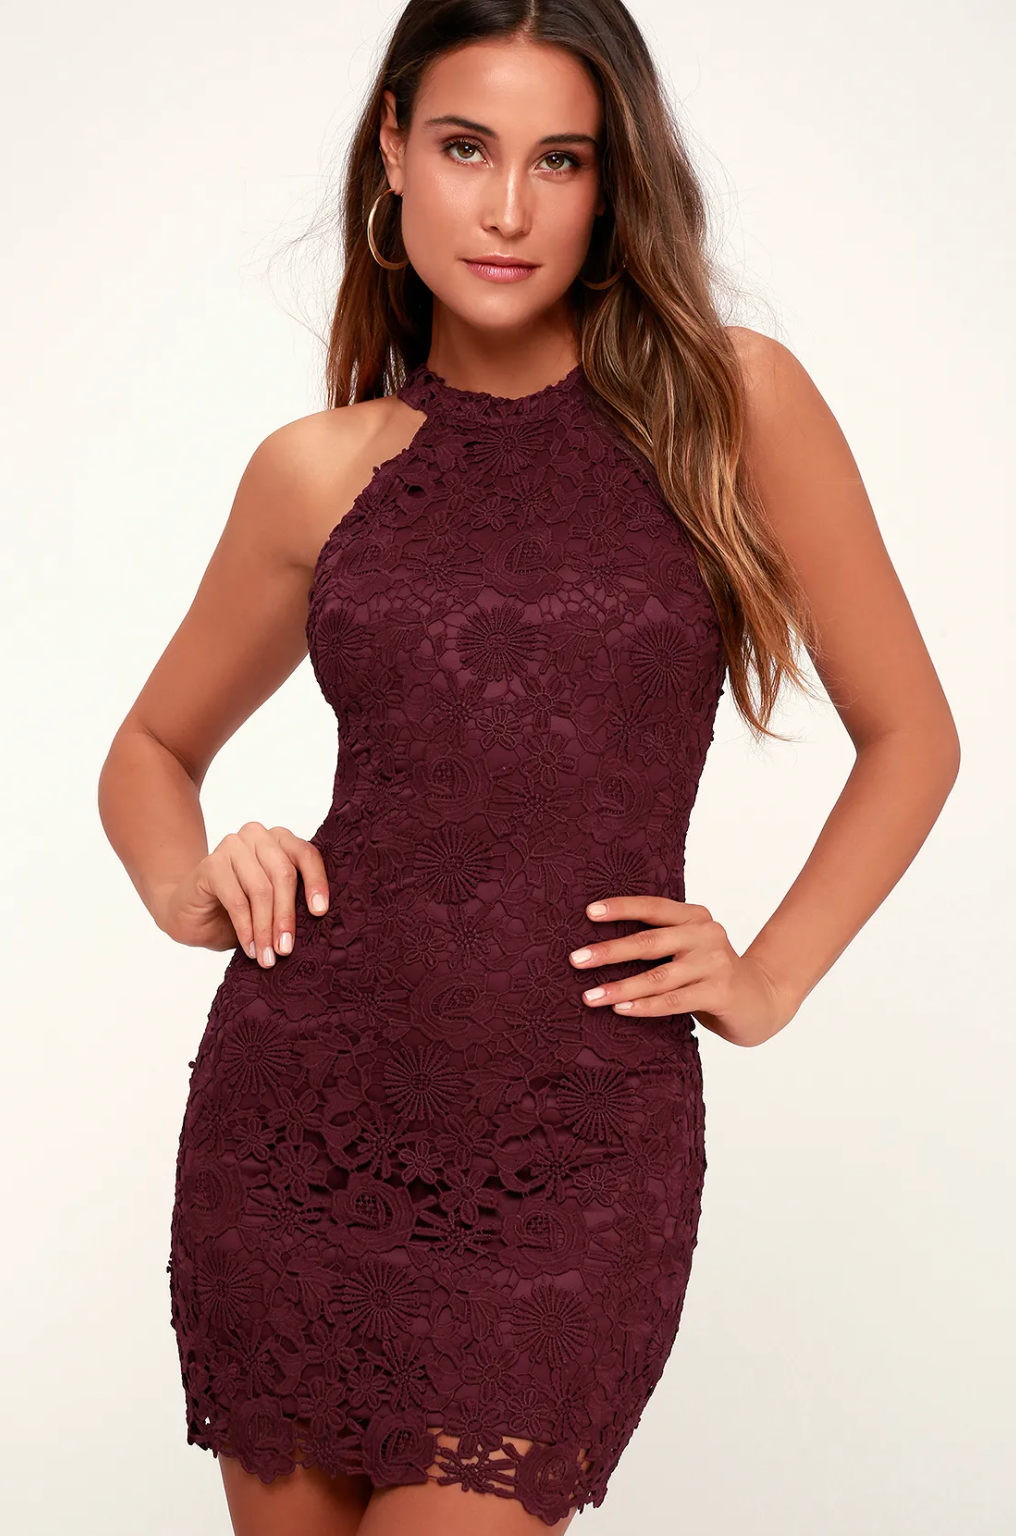 Lace mini dress from Lulu's